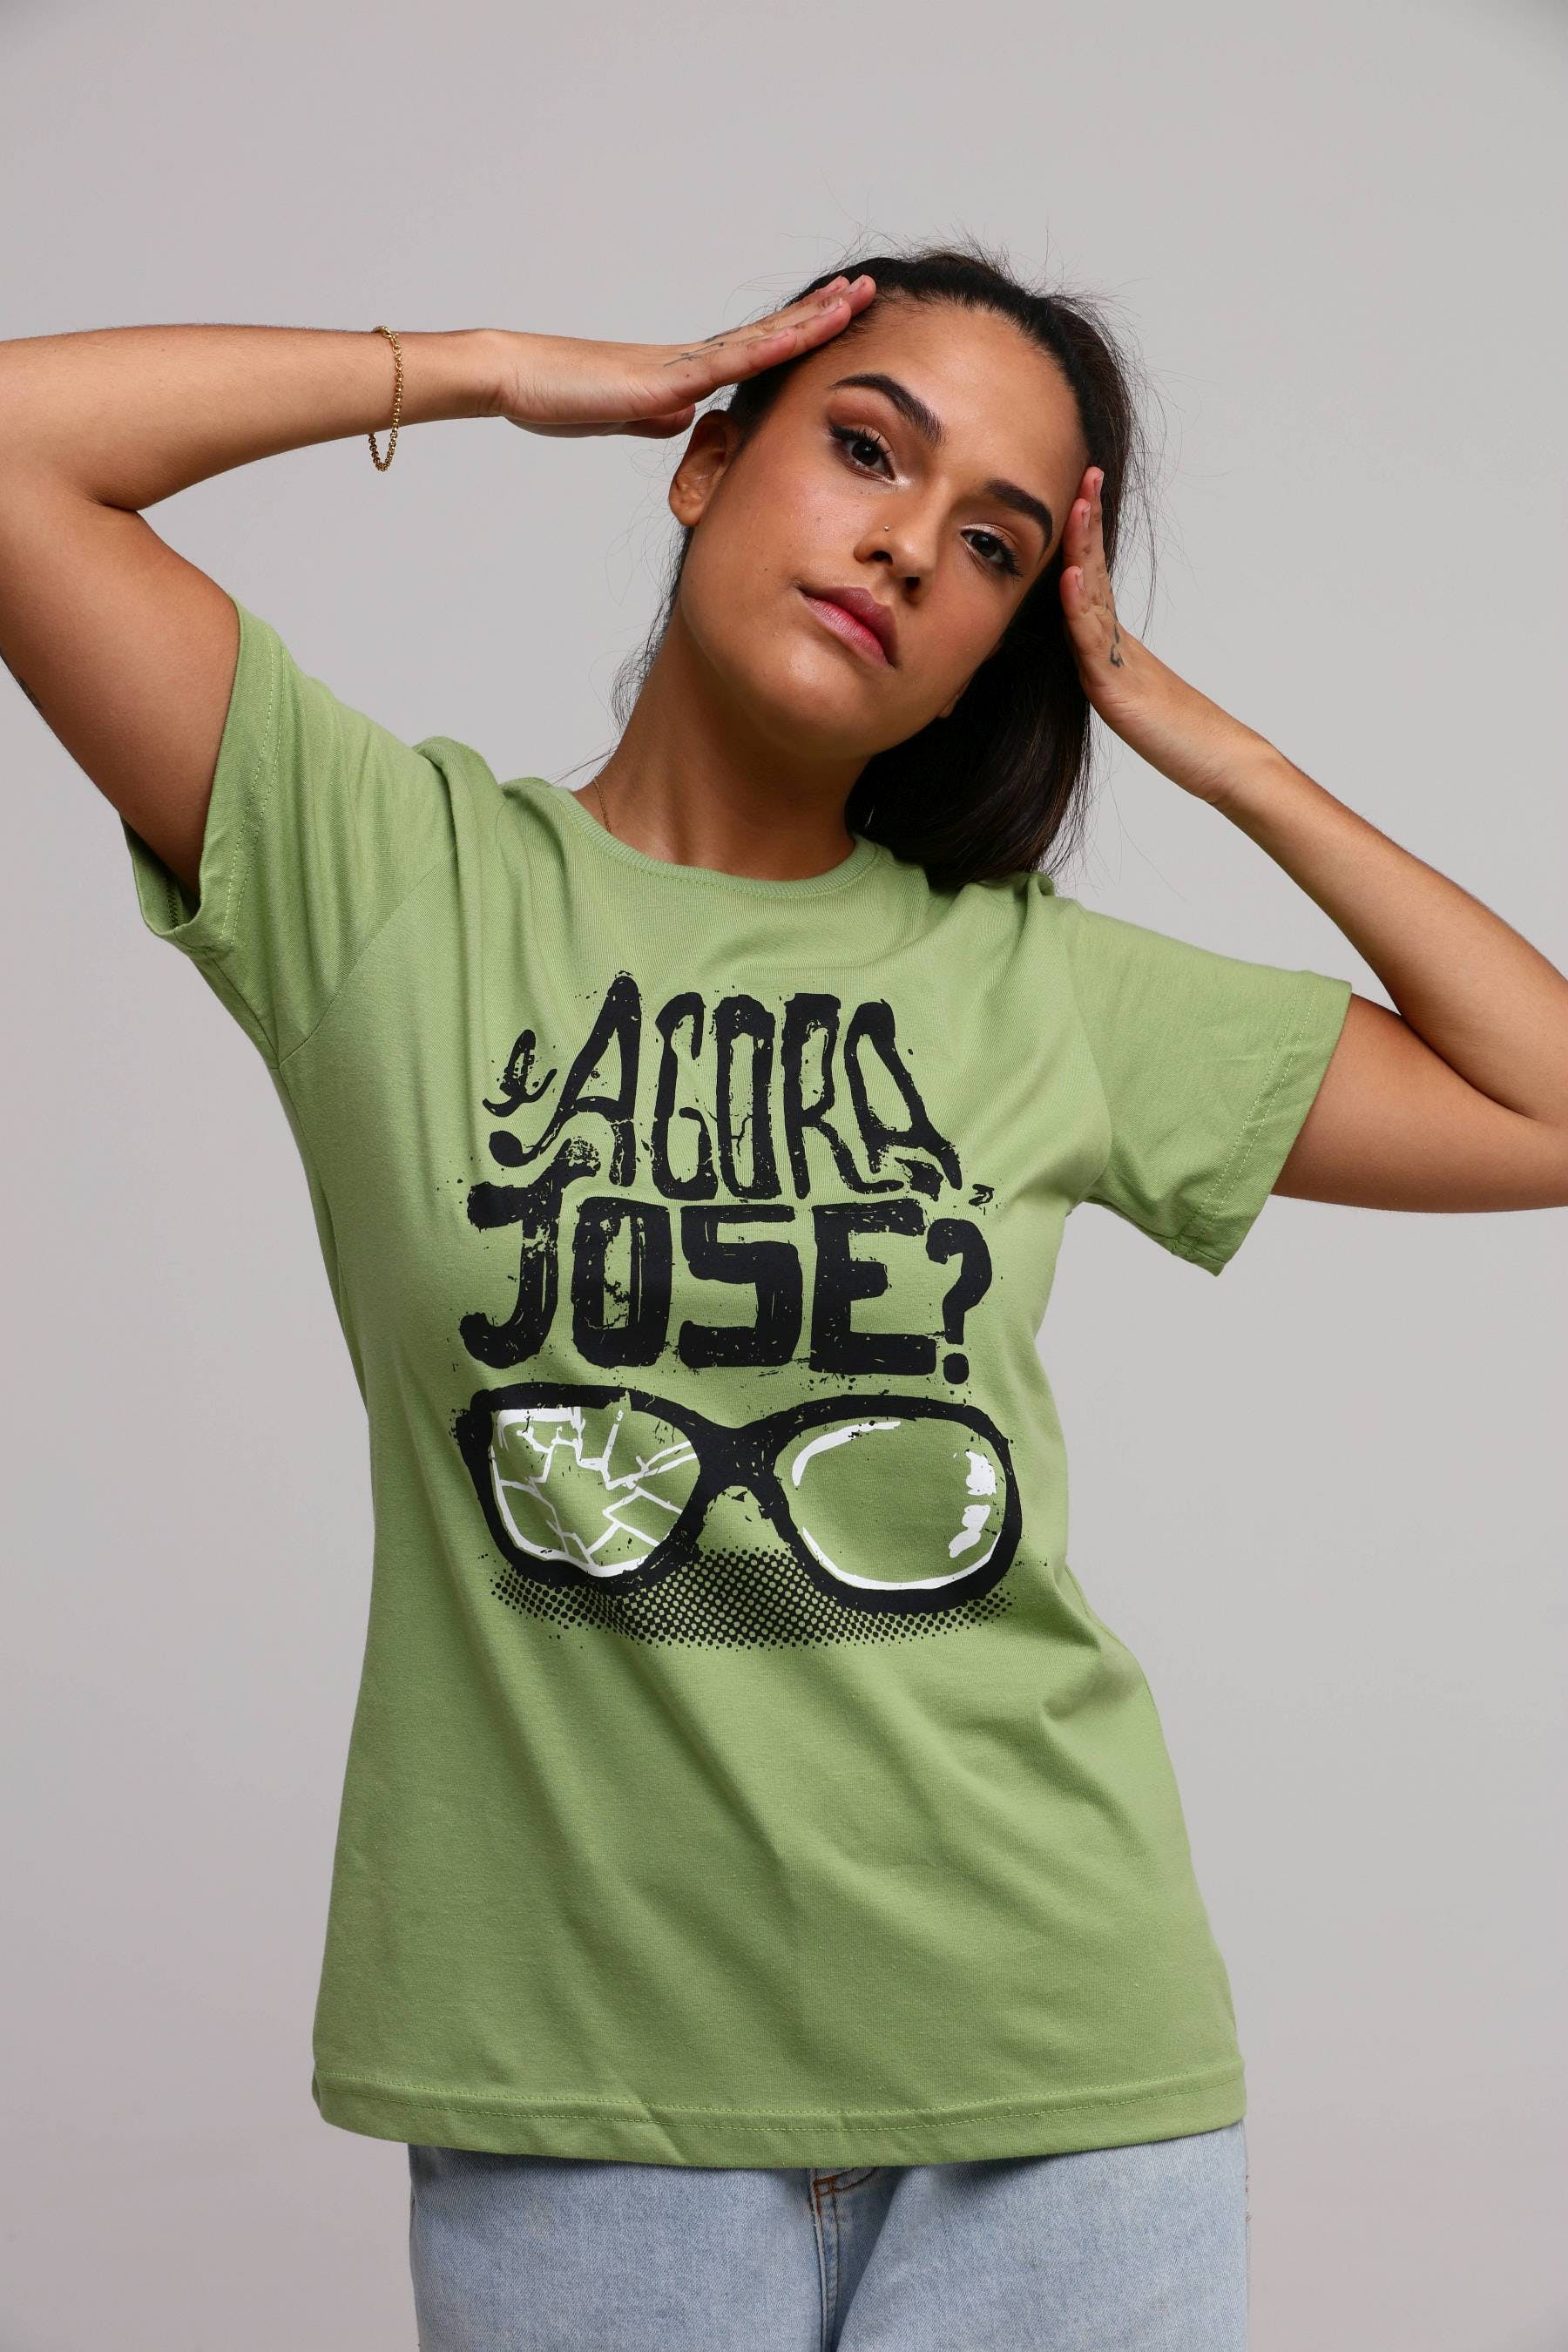 Camiseta E Agora, José?